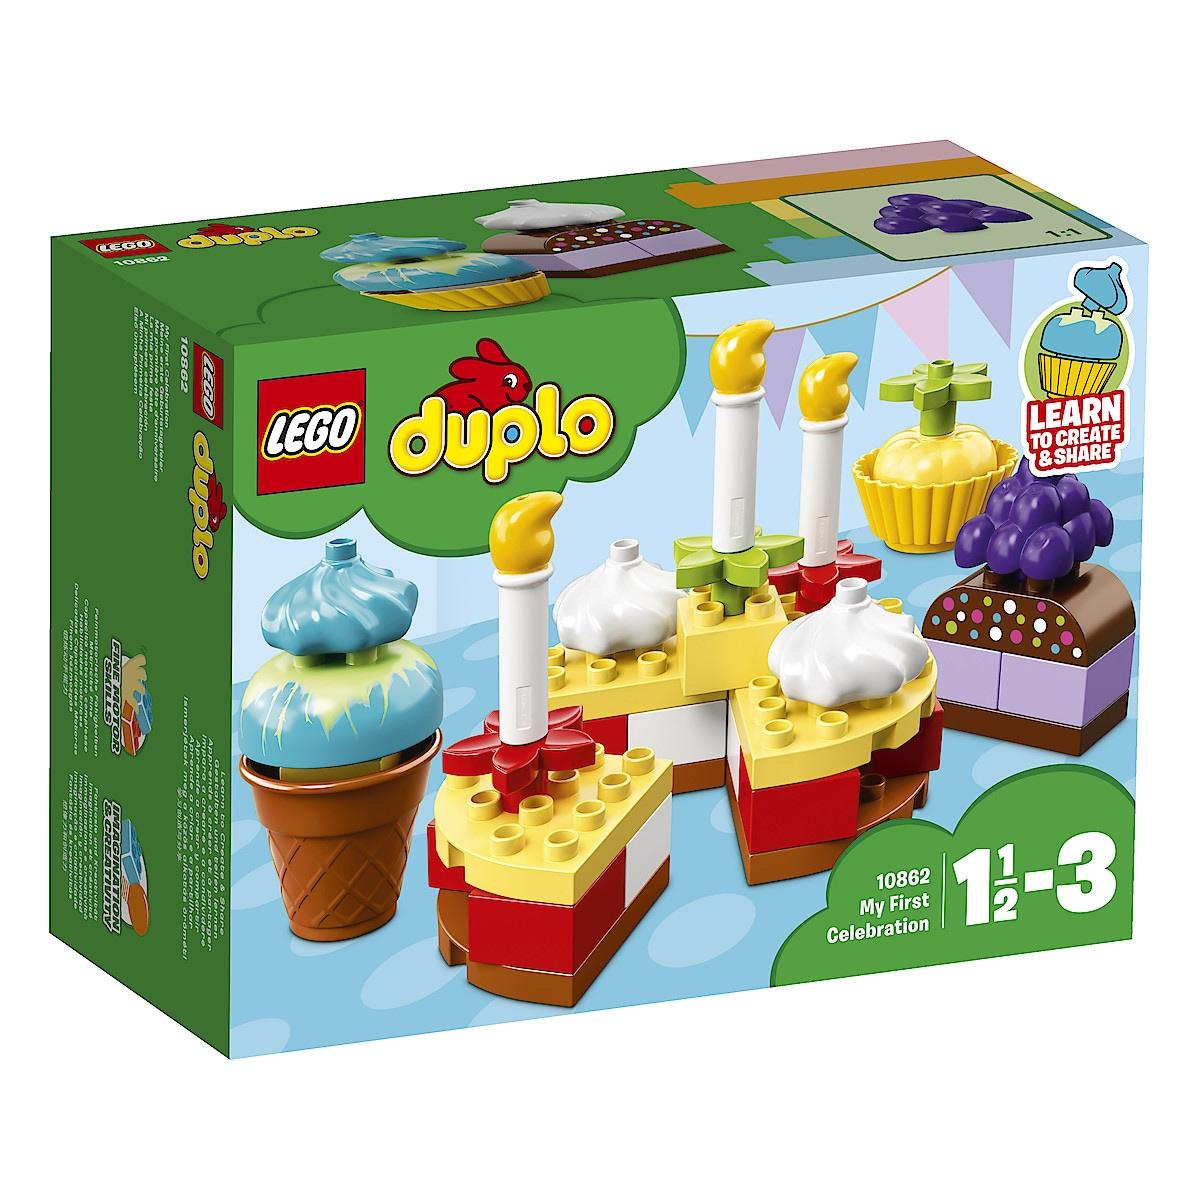 LEGO Duplo 10862, My First Celebration